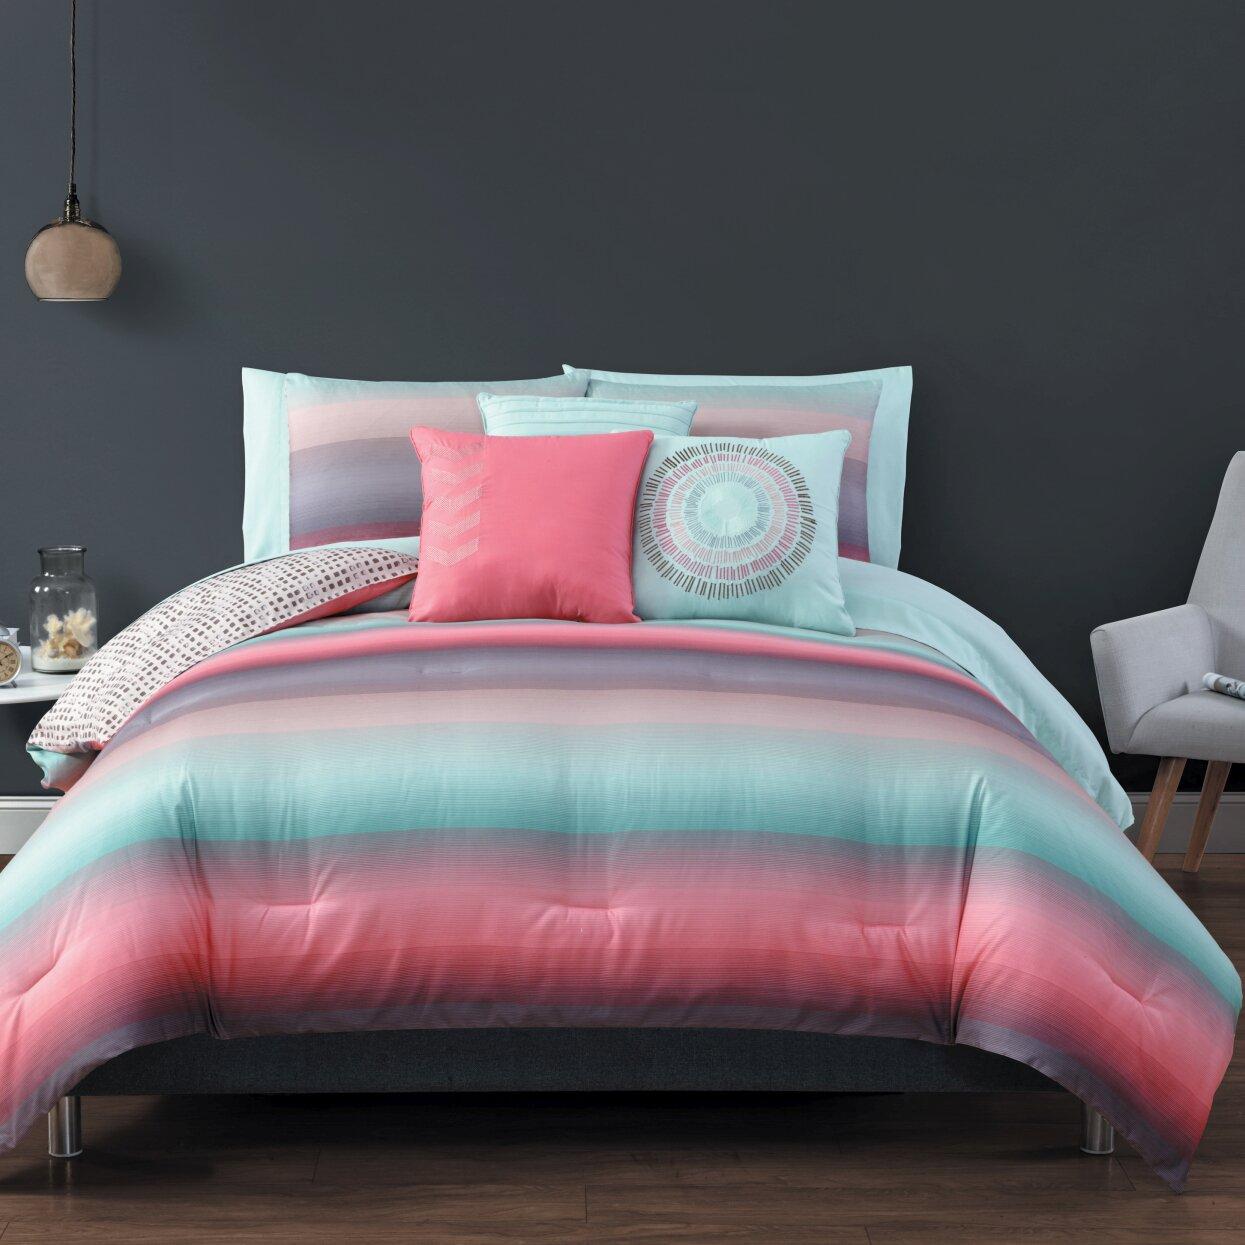 Mercury Row Avans 10 Piece Reversible Bed in a Bag Set